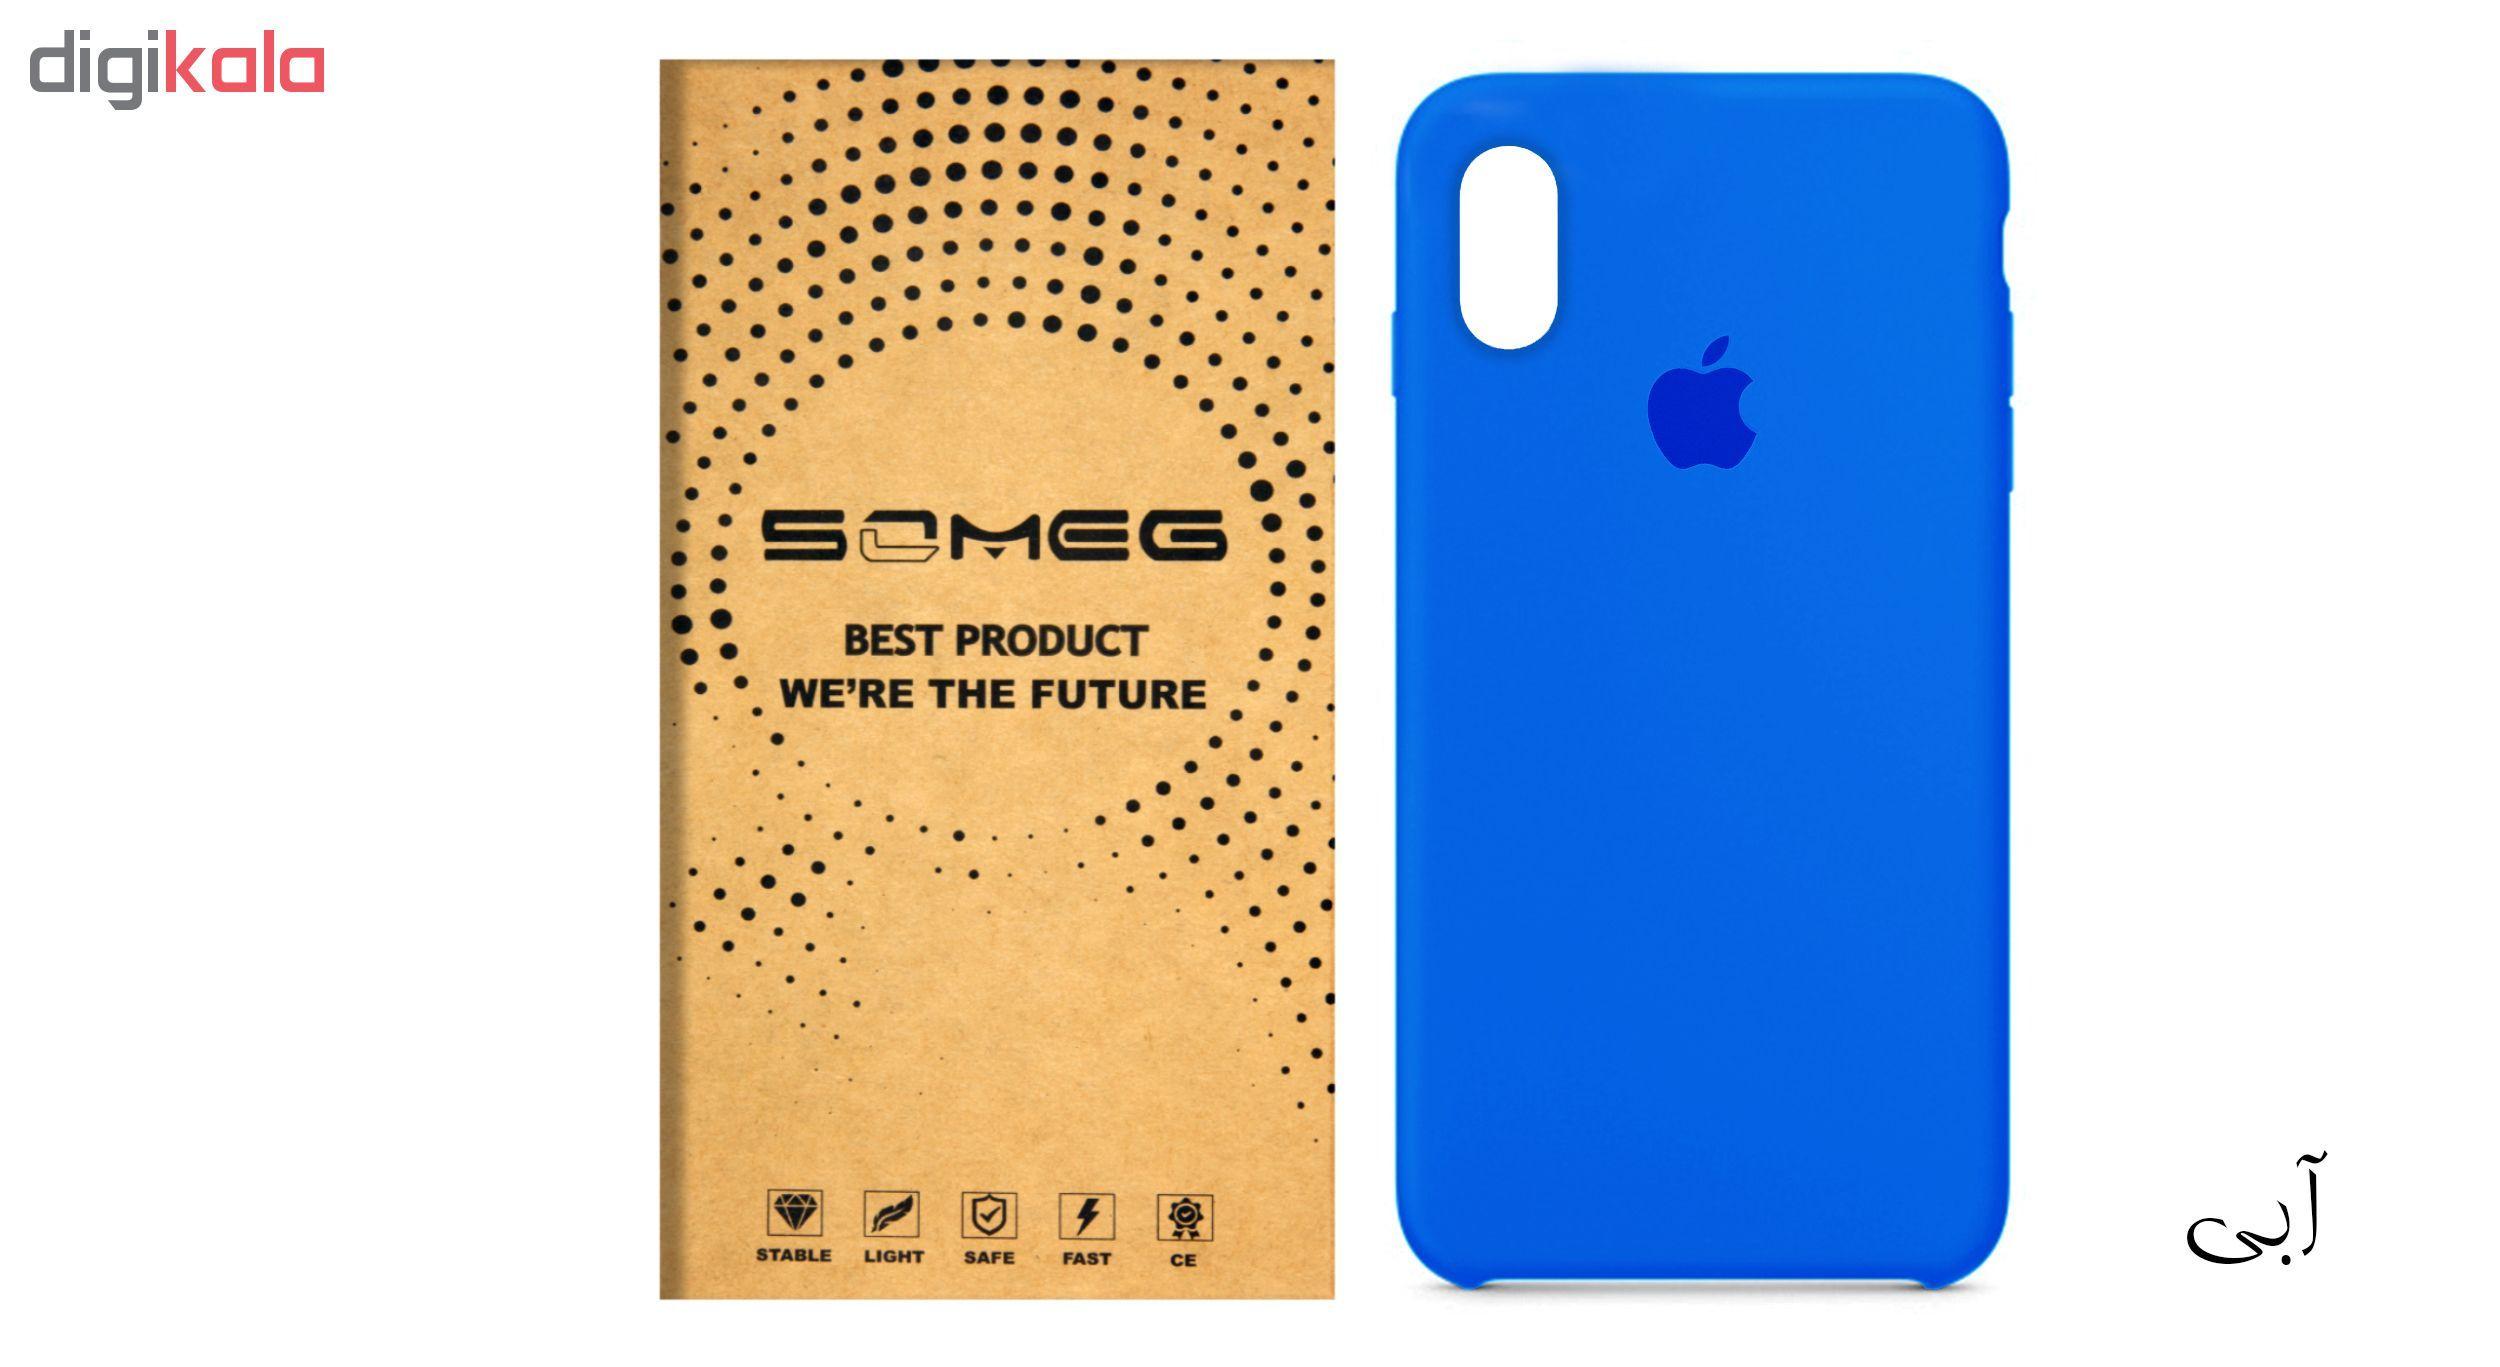 کاور سومگ مدل SIC مناسب برای گوشی موبایل اپل iPhone X  main 1 13